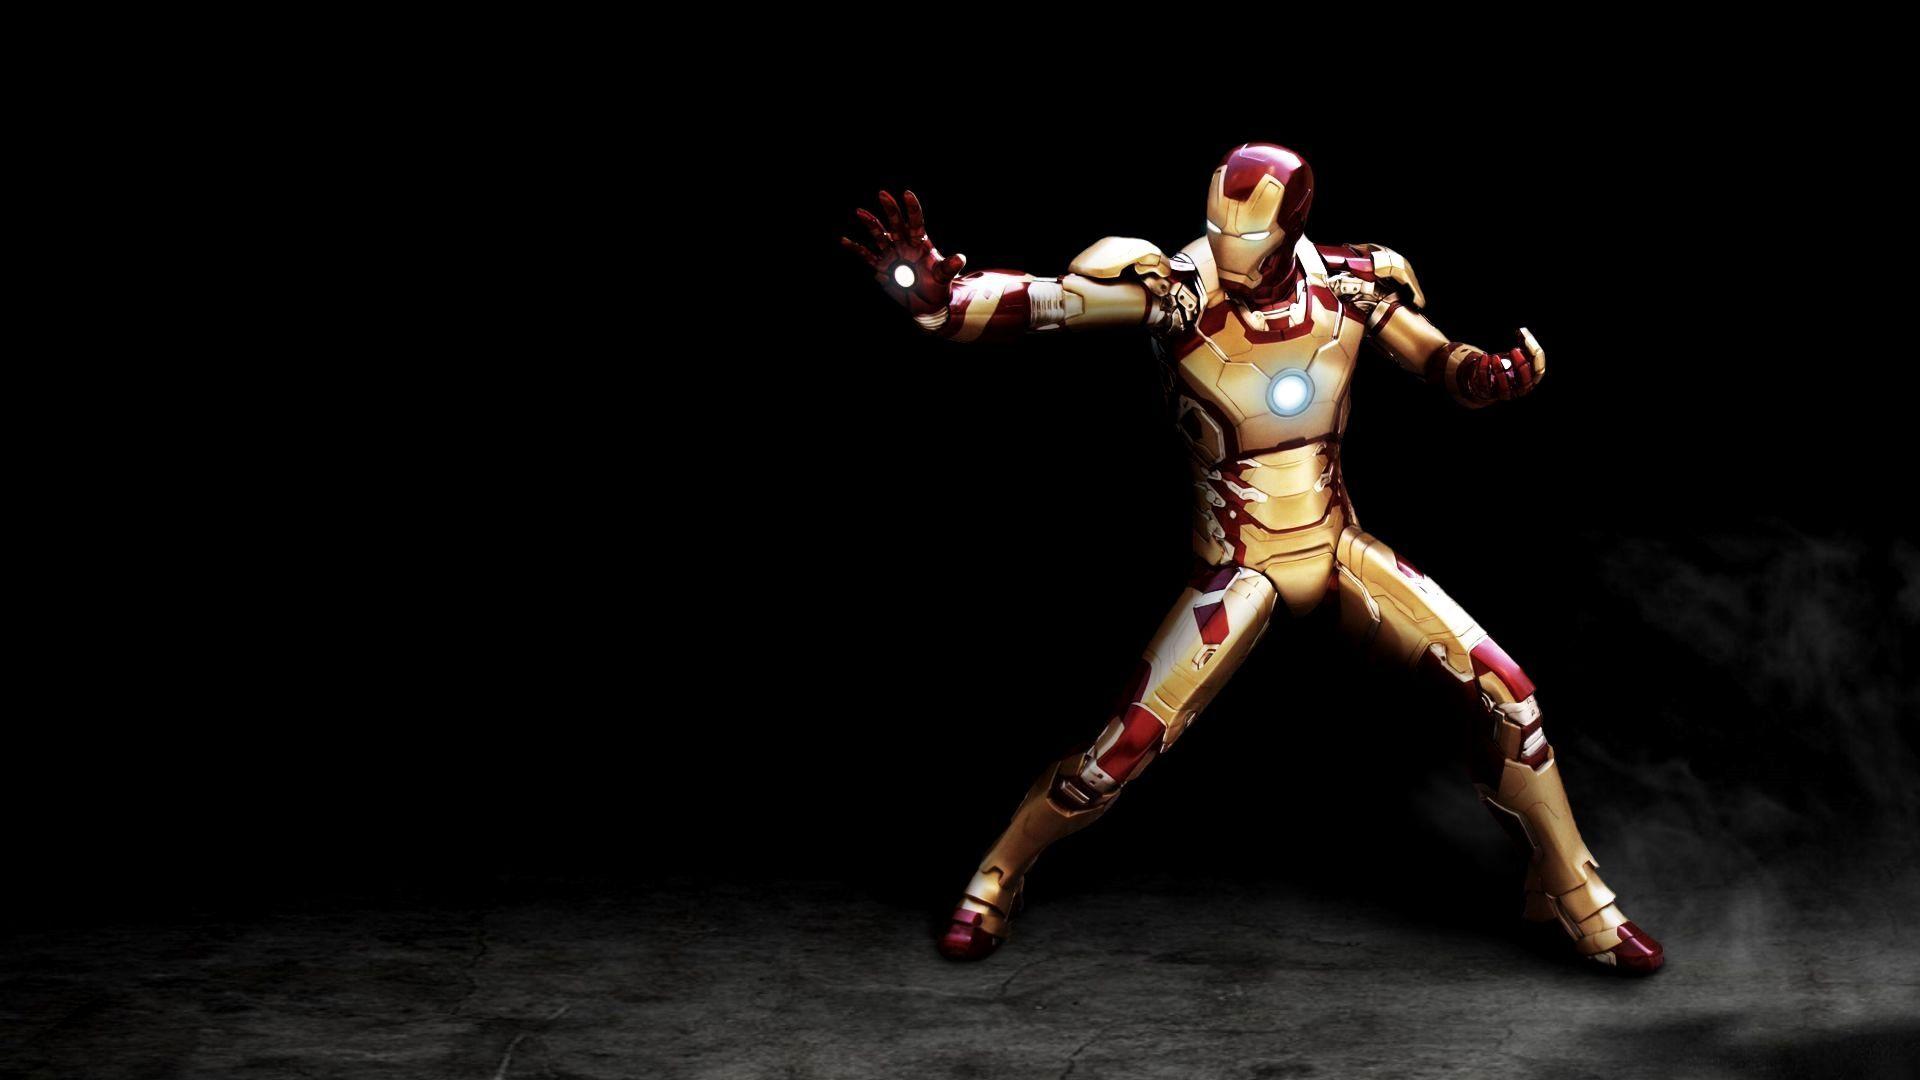 4k Wallpaper For Pc Of Iron Man Gallery Iron Man Wallpaper